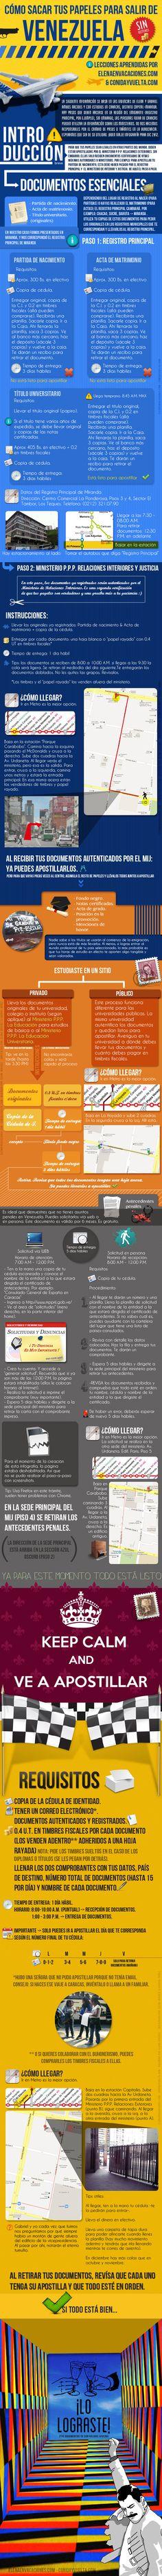 Cómo sacar tus papeles para salir de Venezuela #infografia... coño, muy